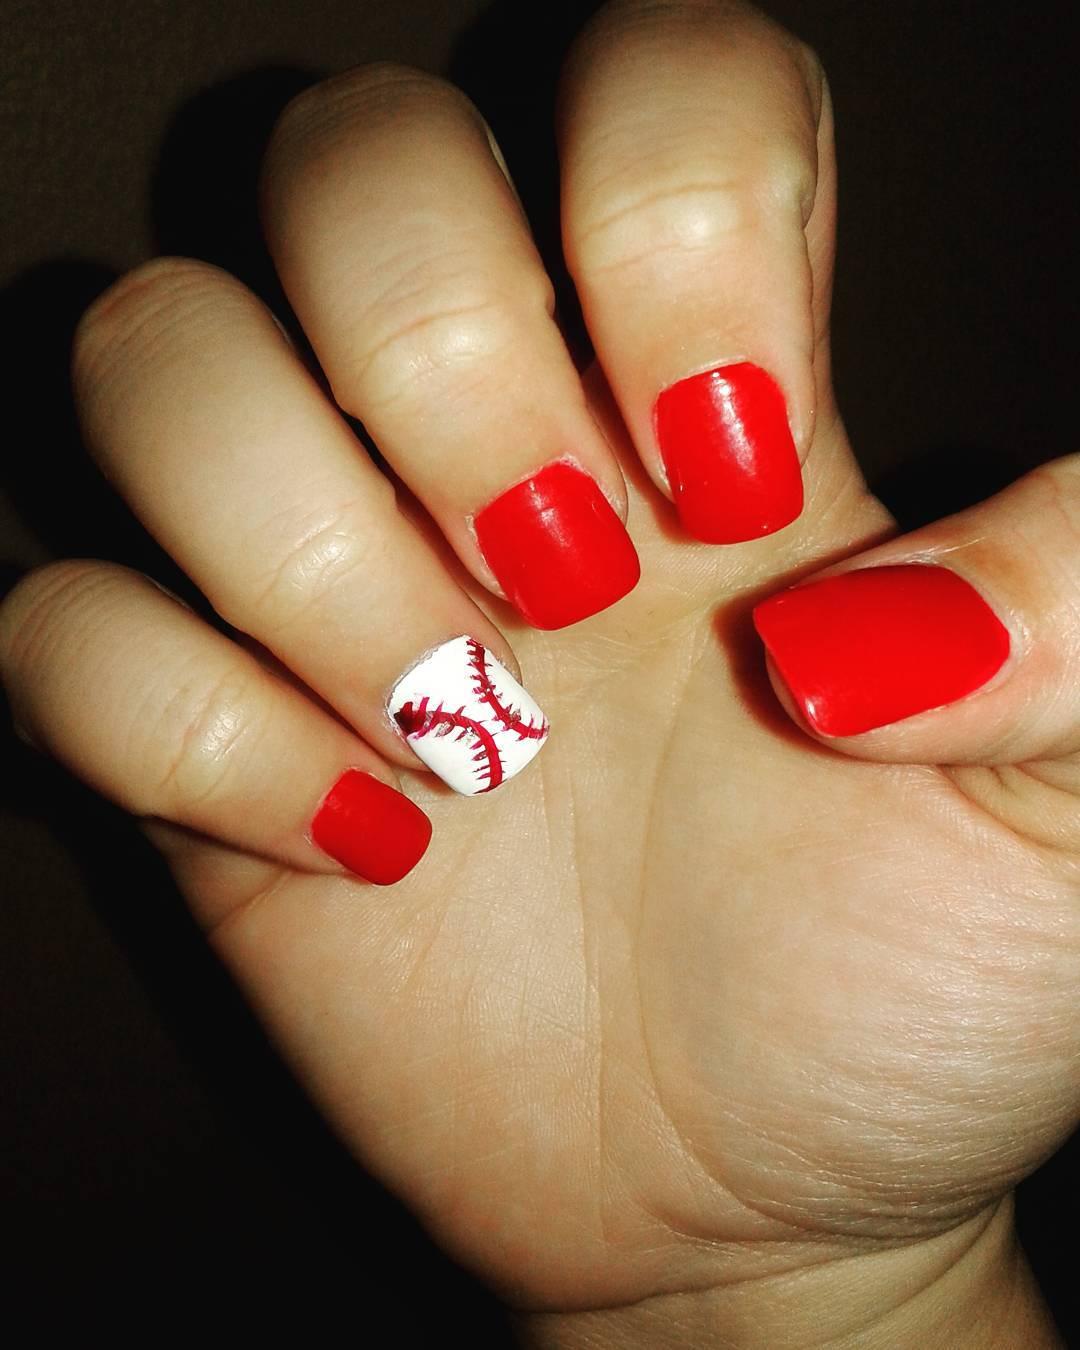 Remarkeble Baeball Nail Design